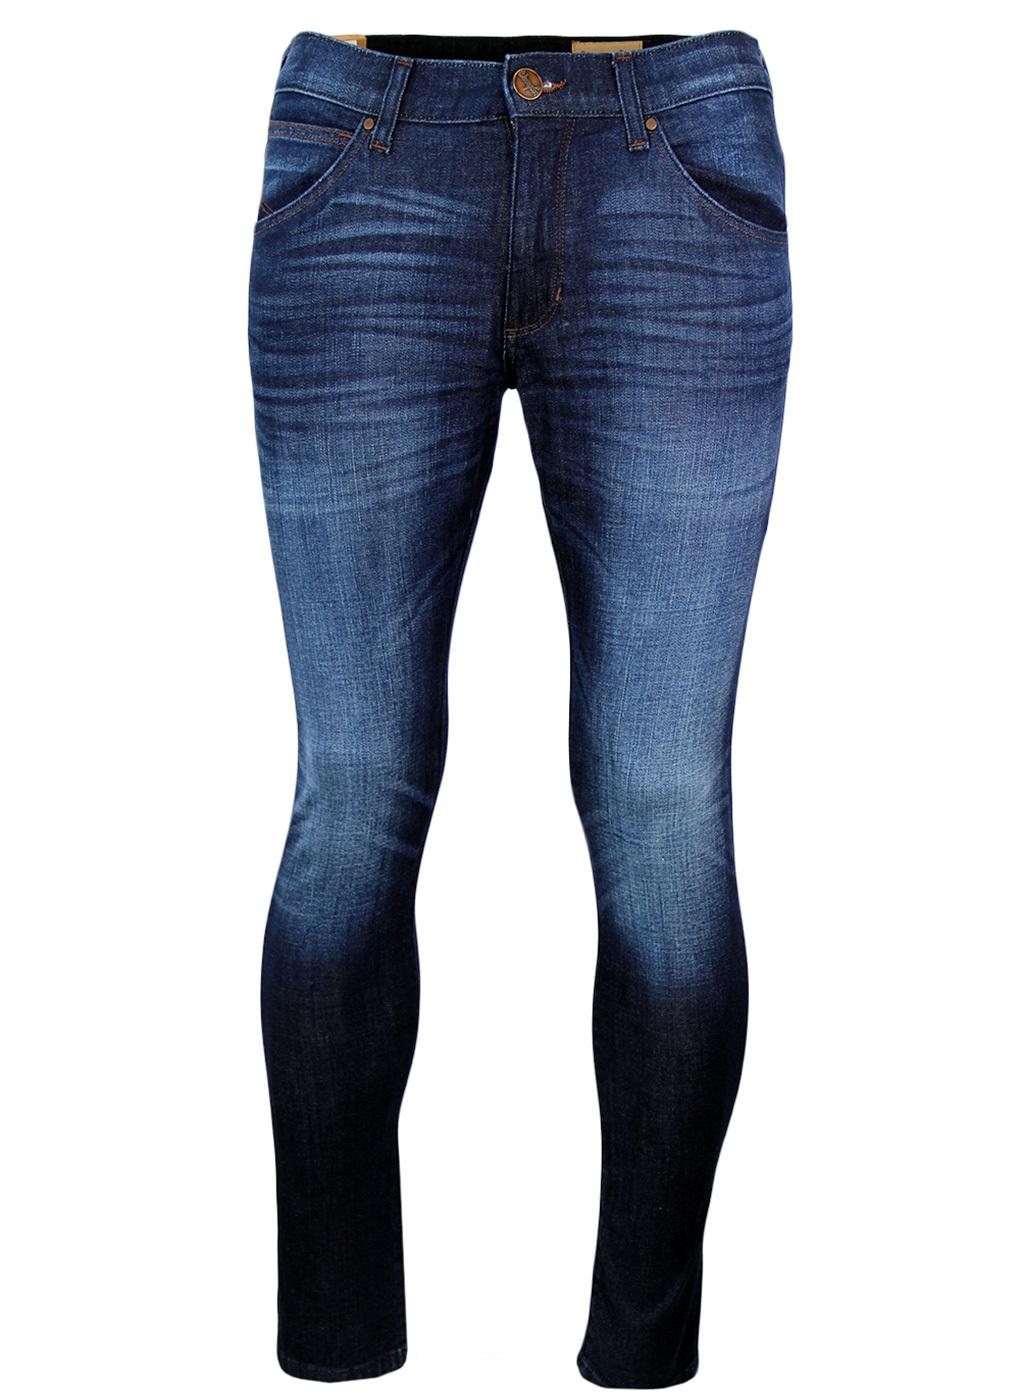 Bryson WRANGLER Retro Mod Skinny Denim Jeans